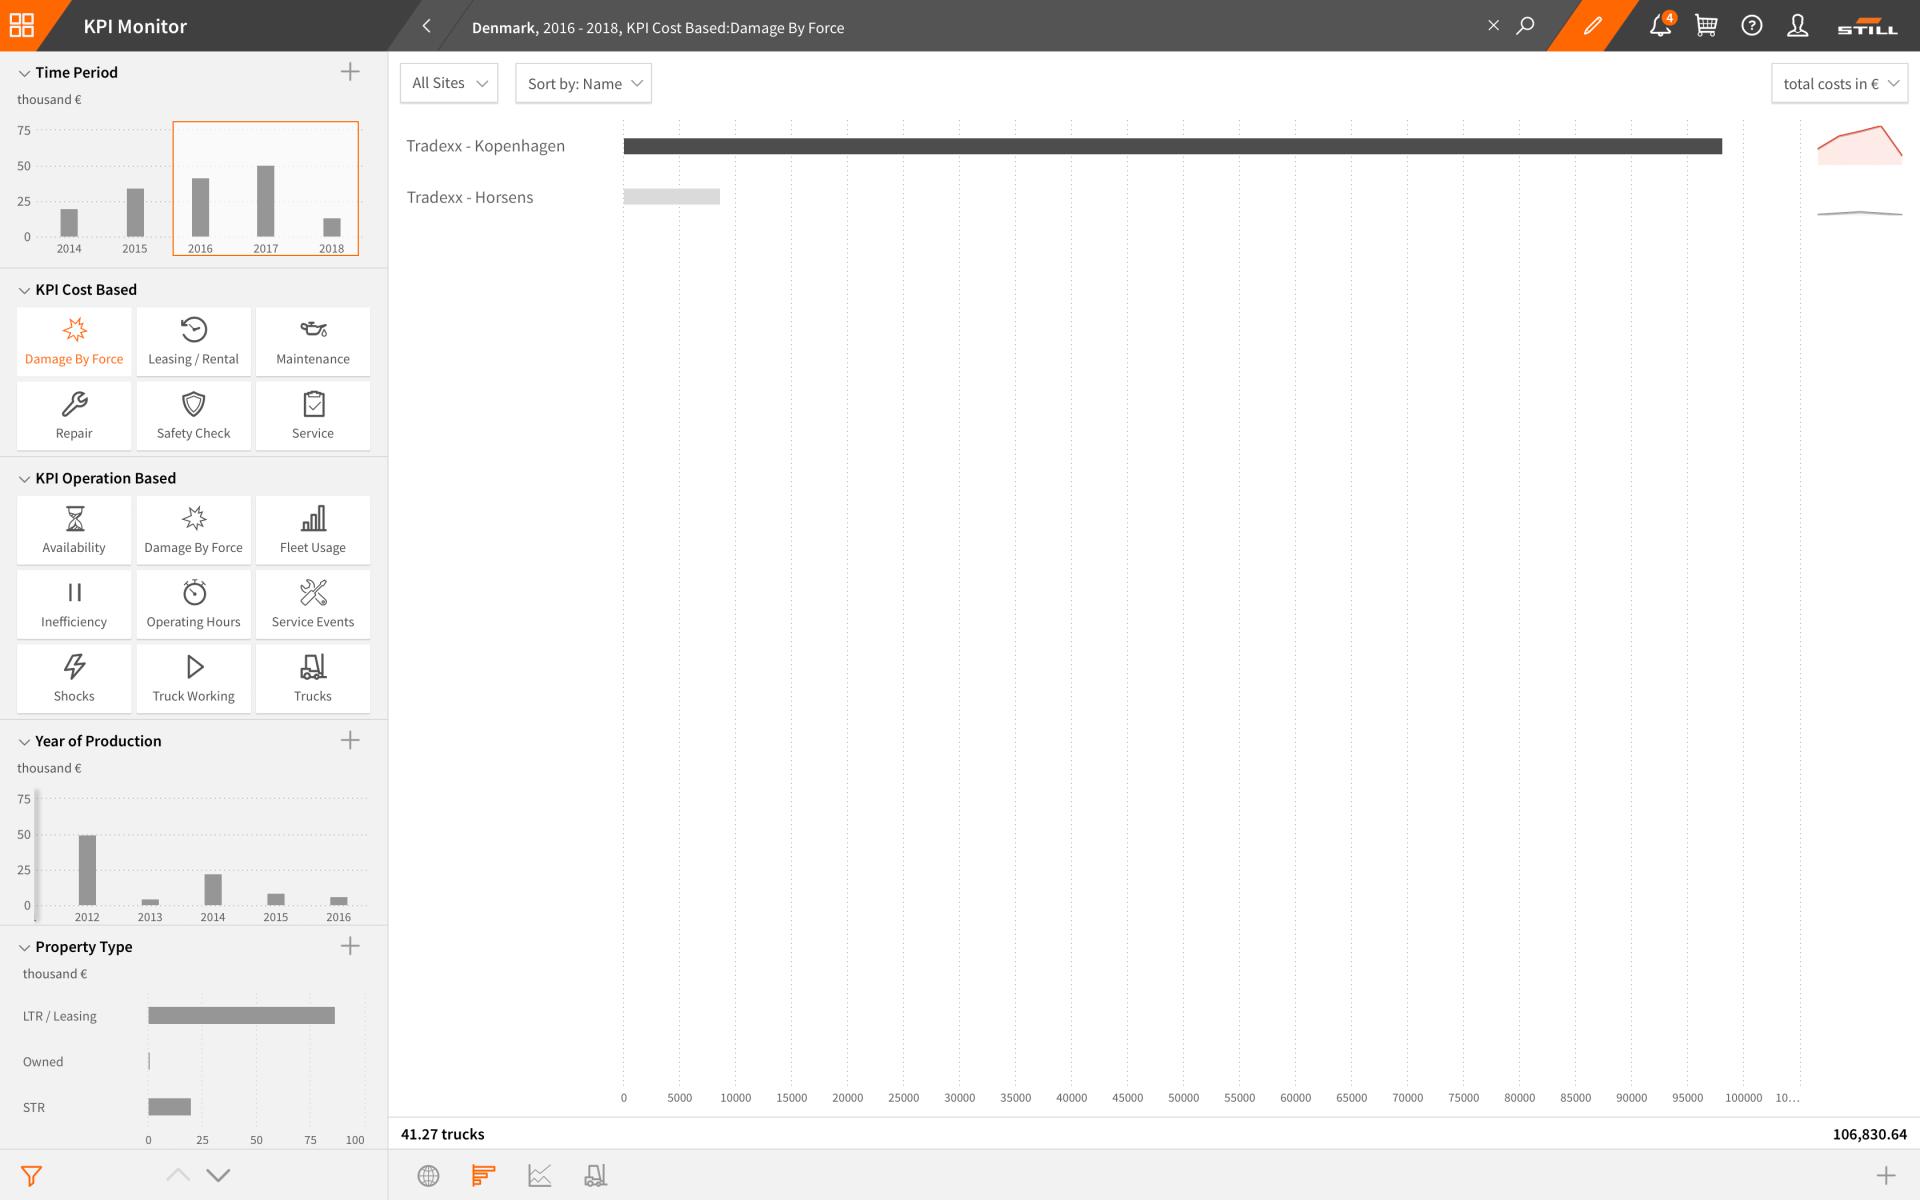 KPI Monitor